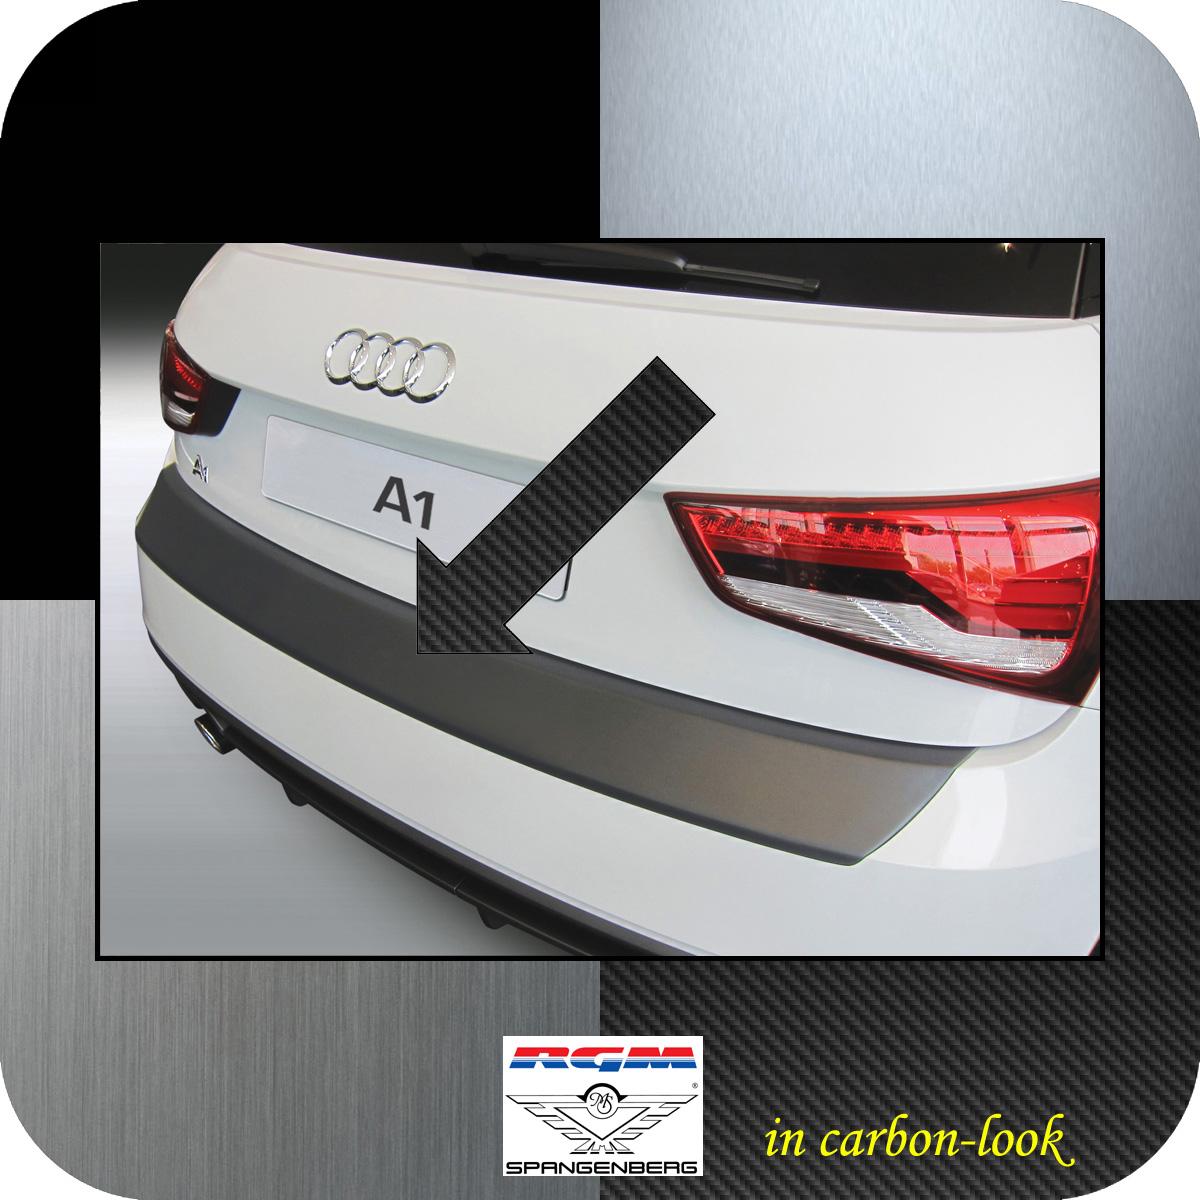 Ladekantenschutz Carbon-Look Audi A1 auch Sportback facelift 2015-2018 3509887